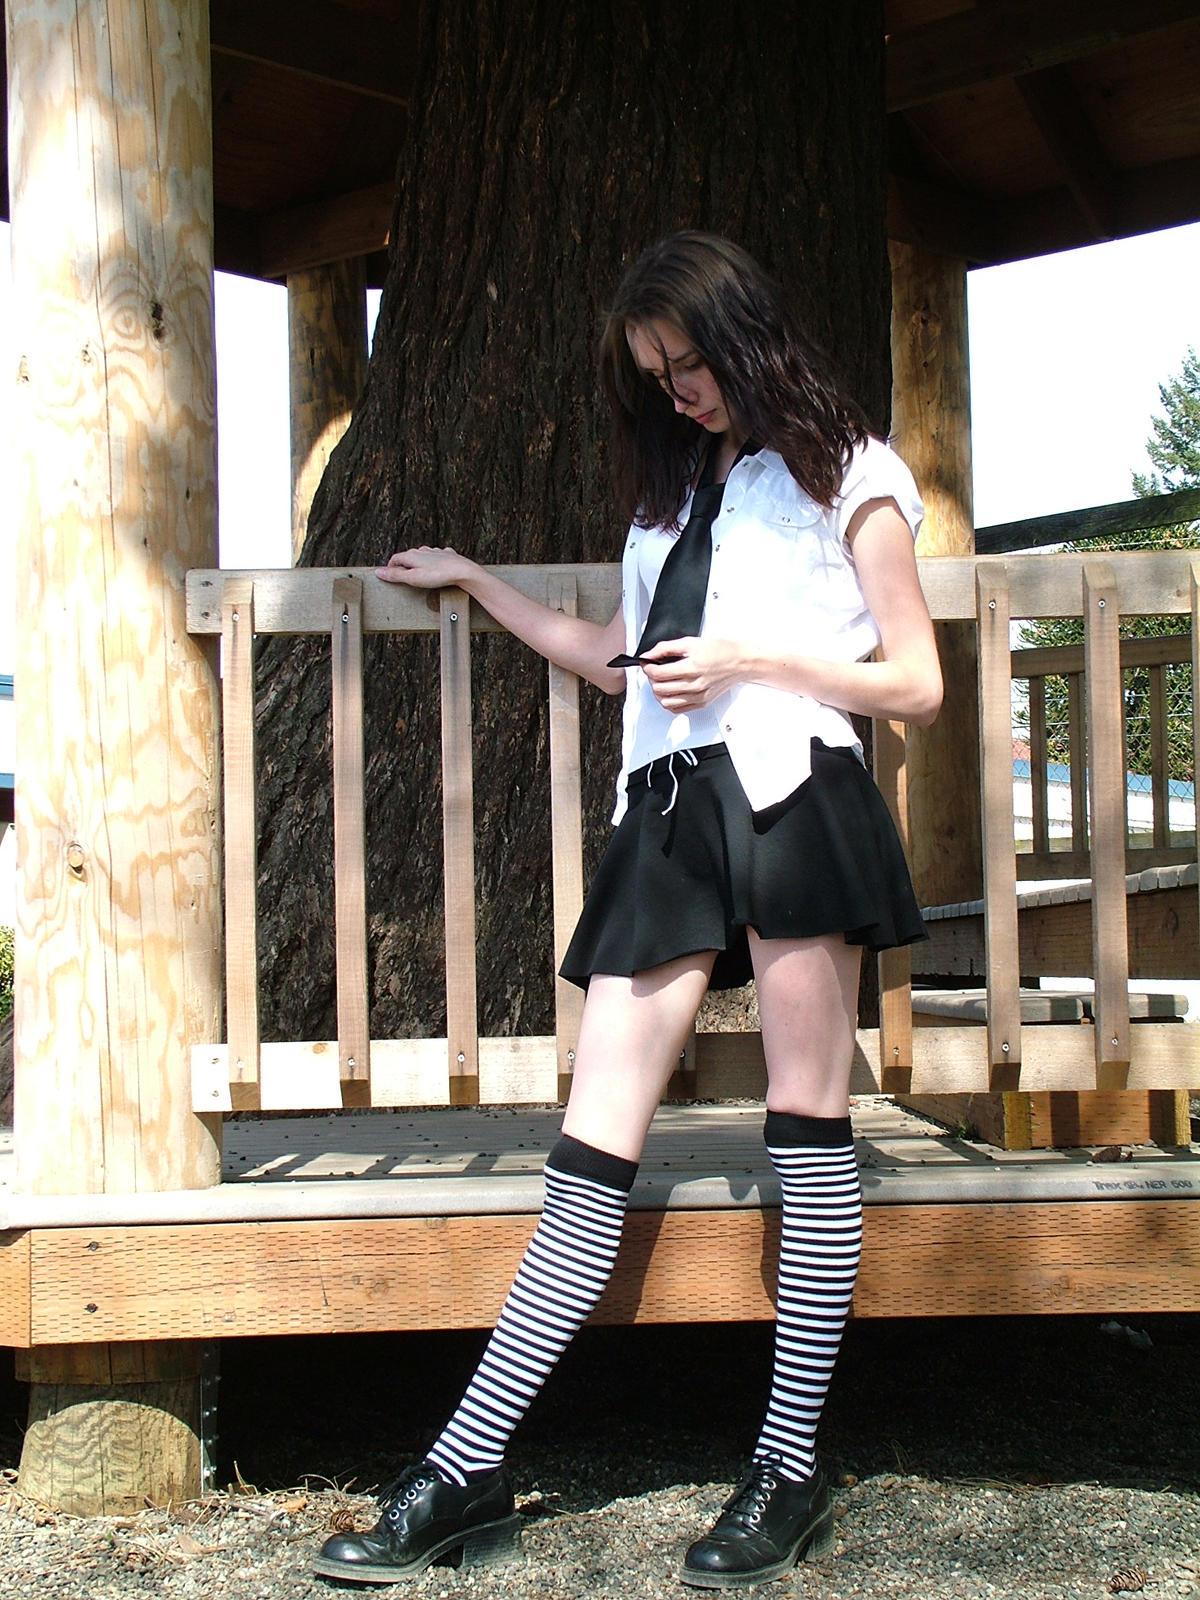 sunny schoolgirl 1 by JensStockCollection